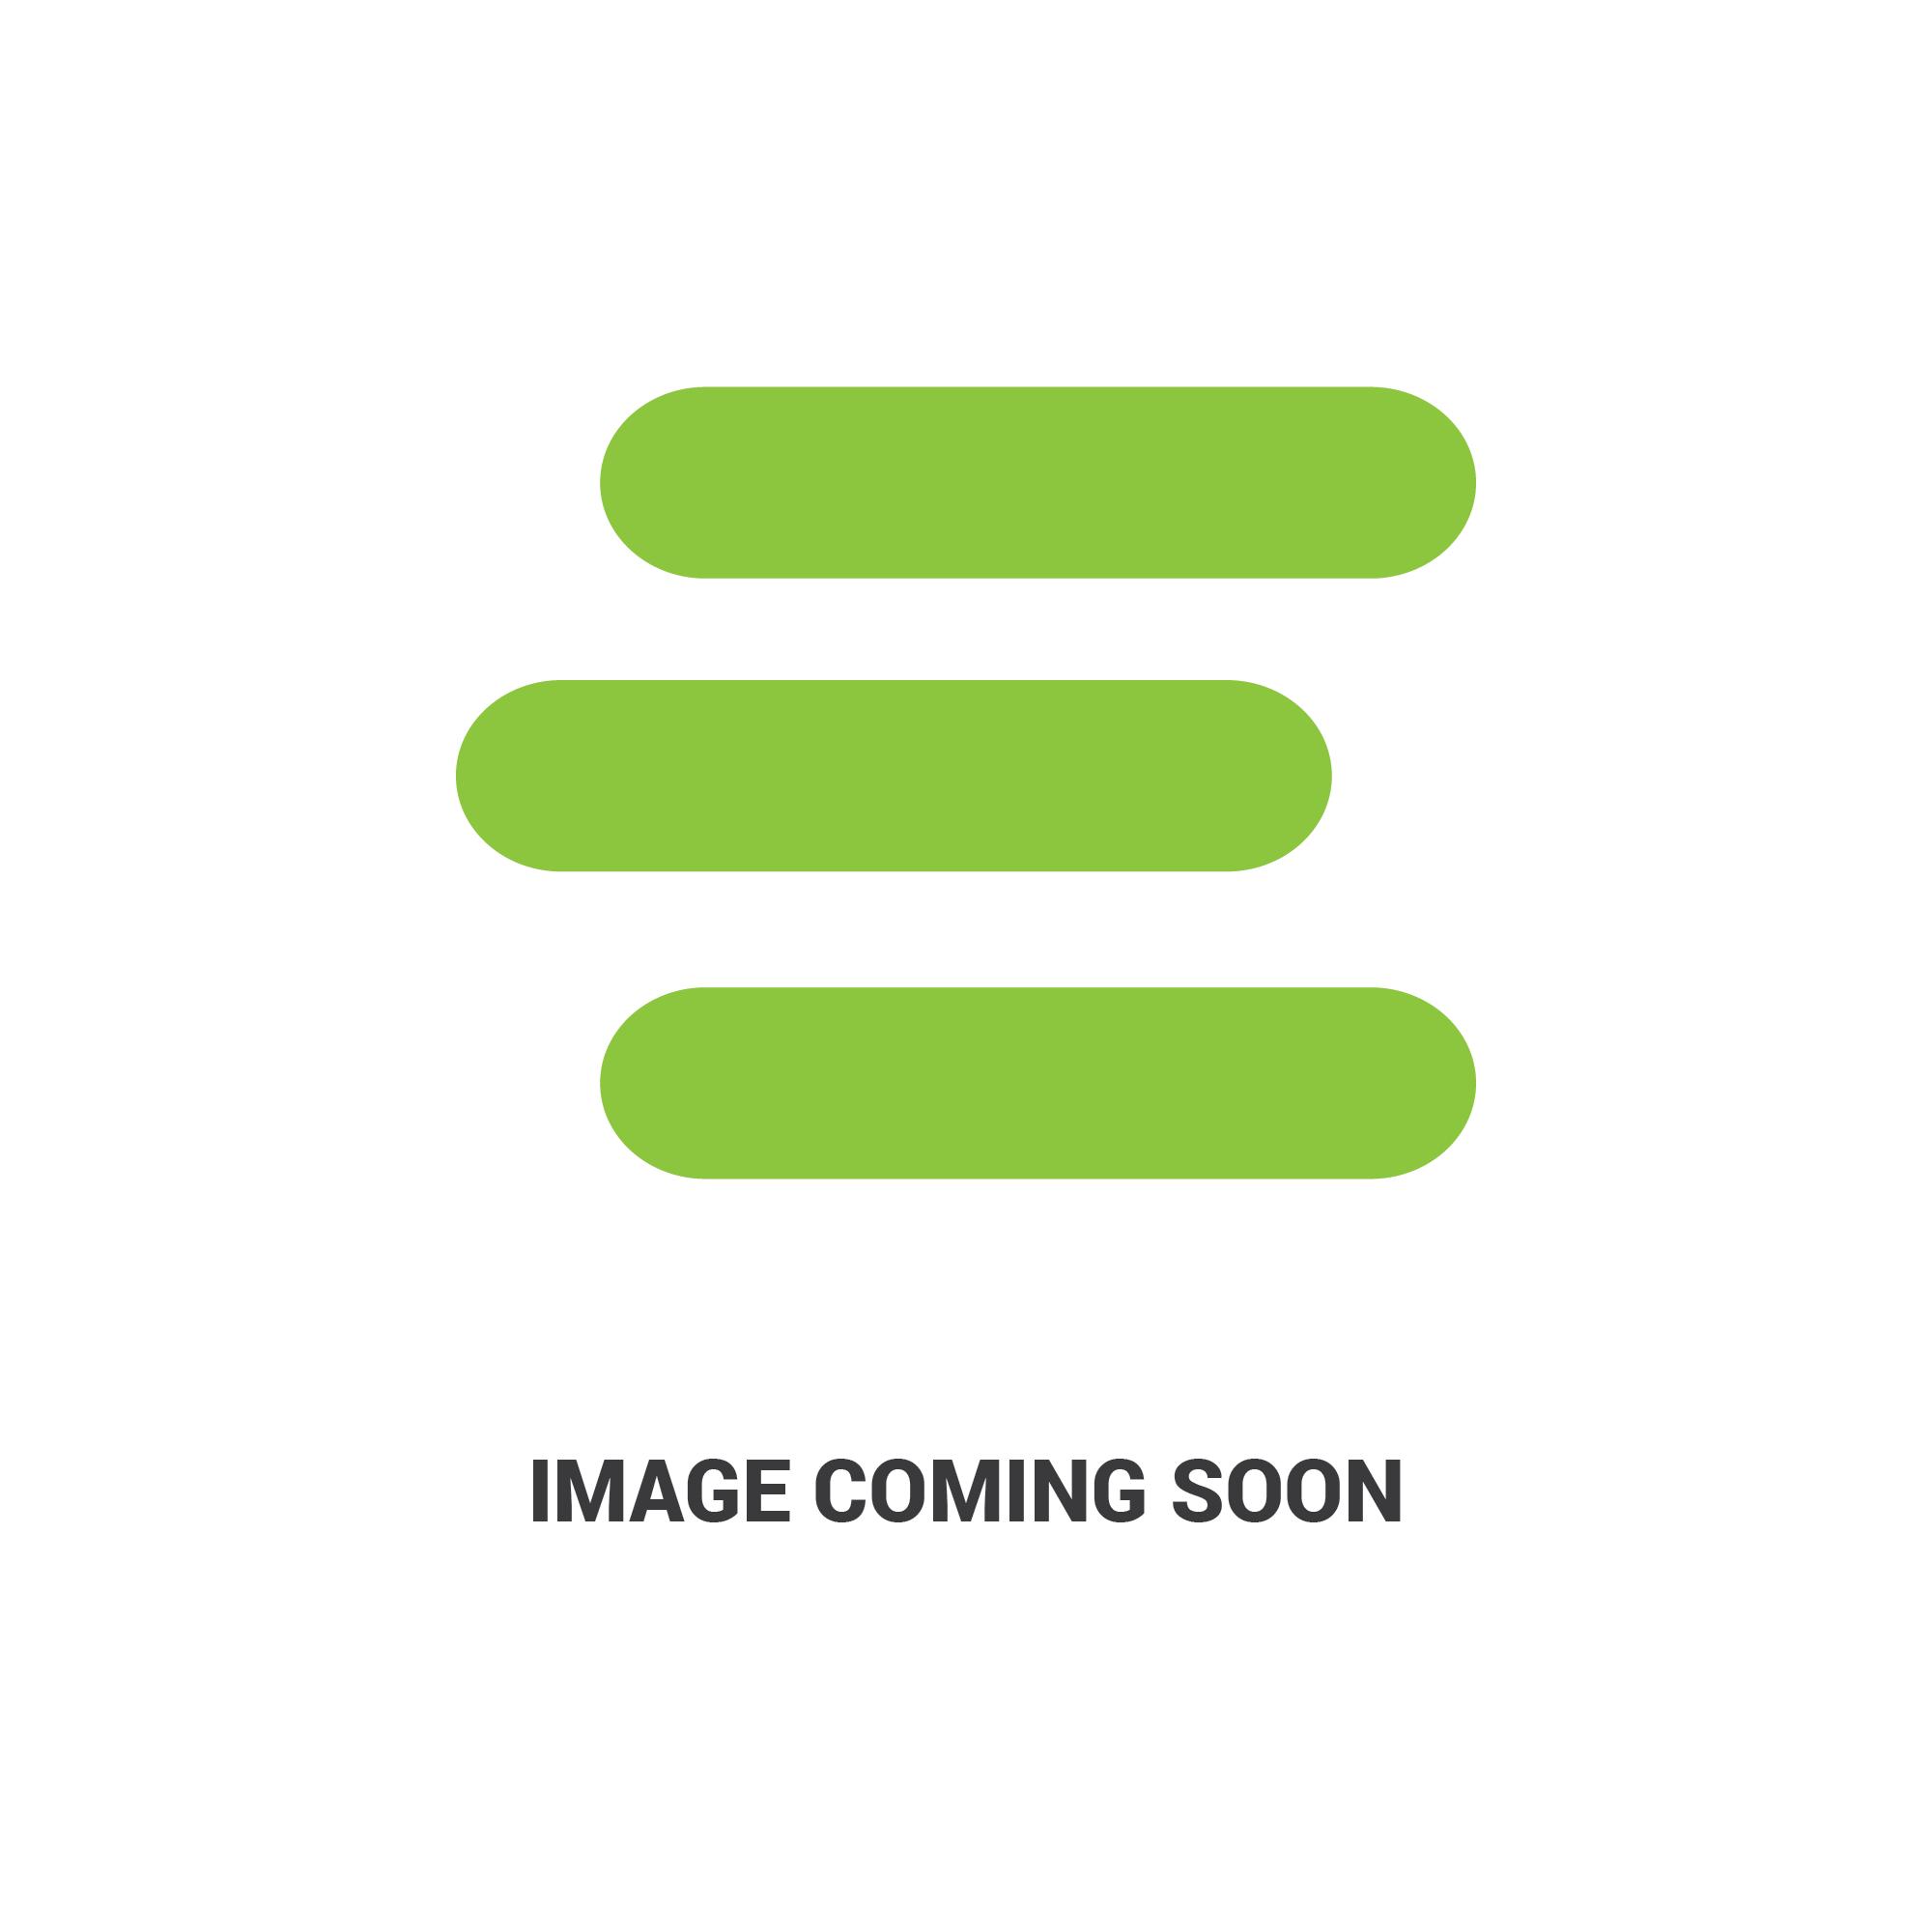 E-FP13663_2.jpg